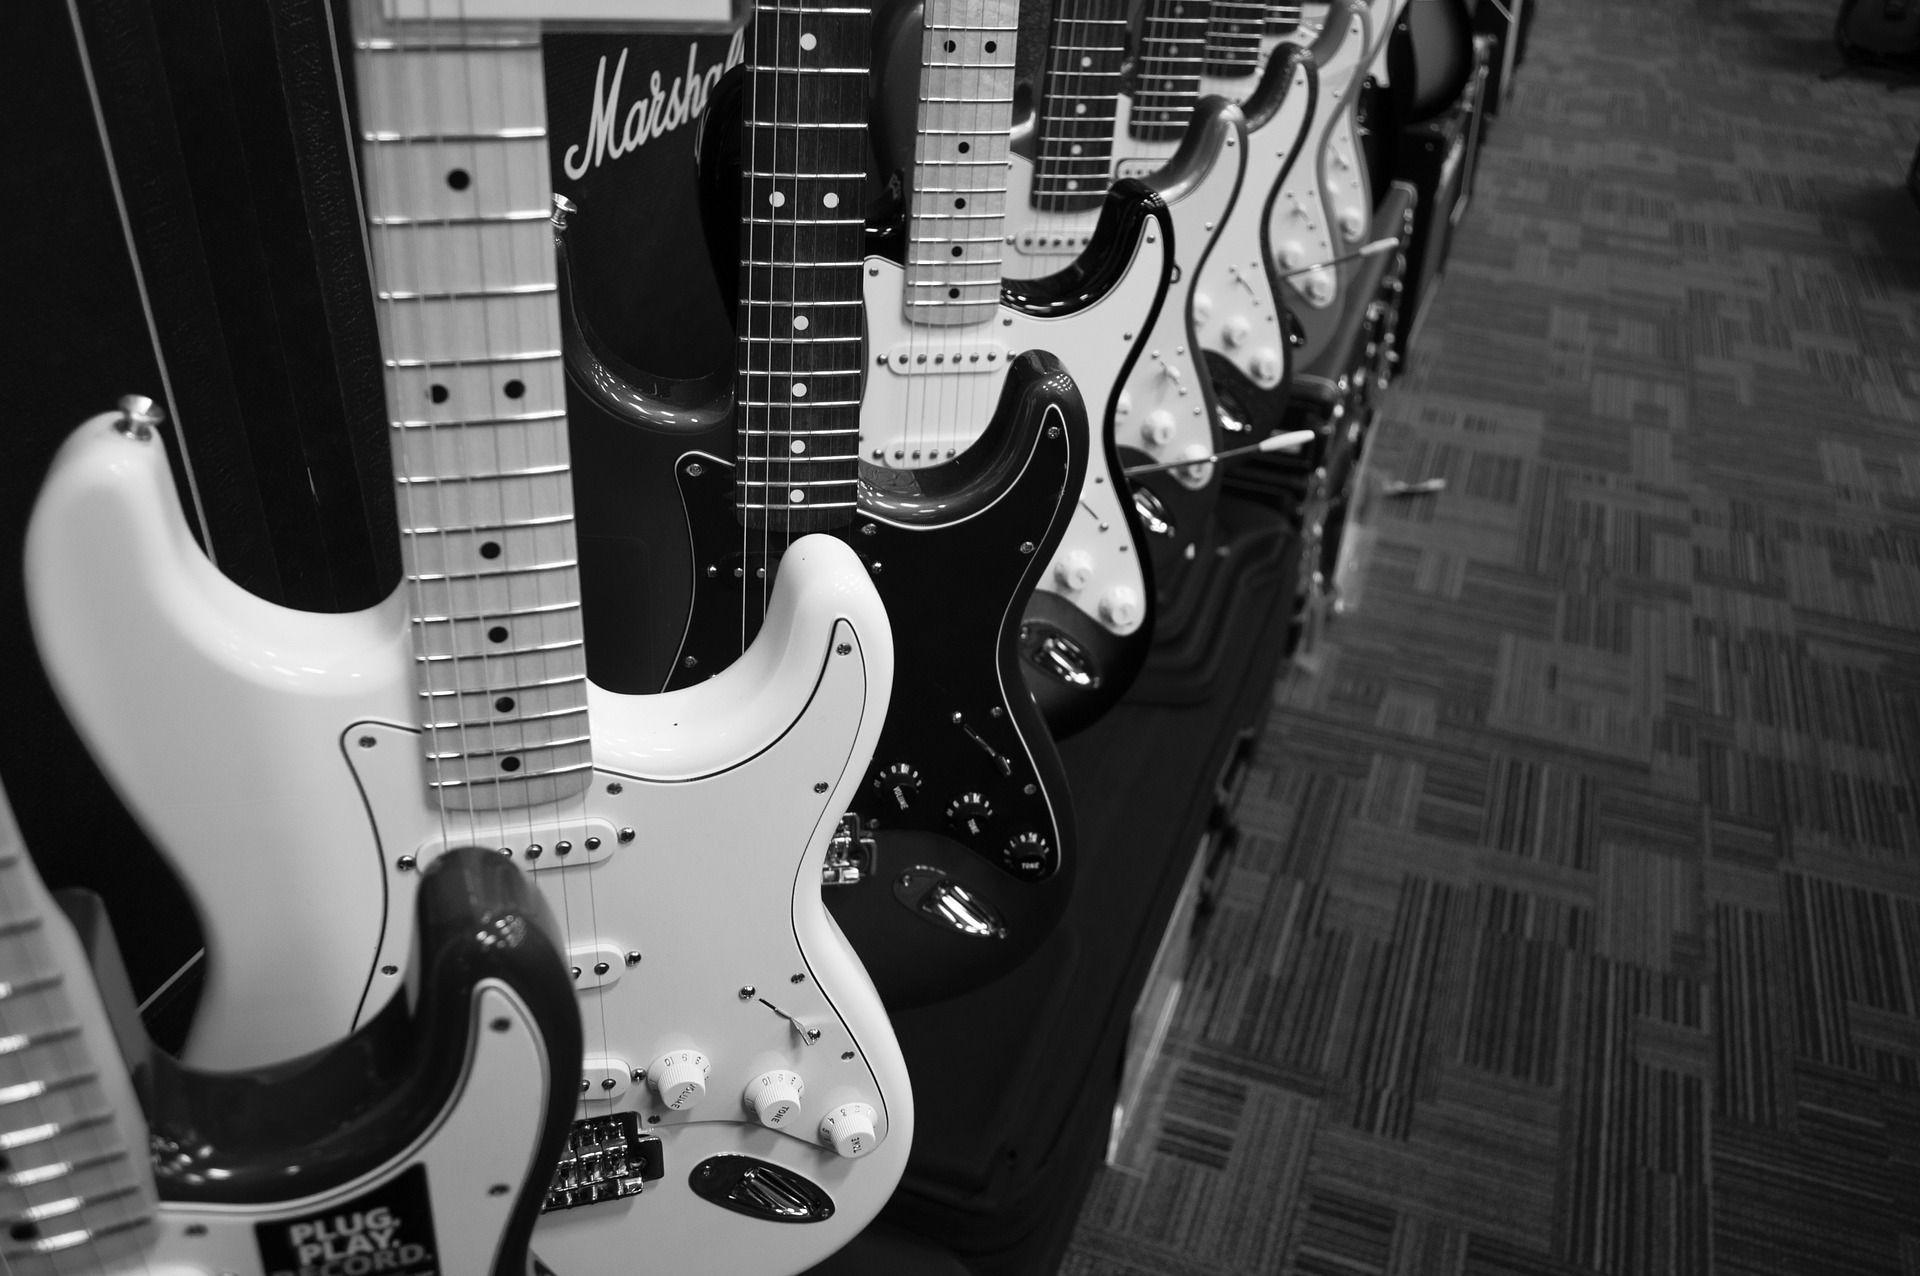 D nde puedo comprar mi primer guitarra clases de guitarra for Donde puedo comprar ceramicas baratas